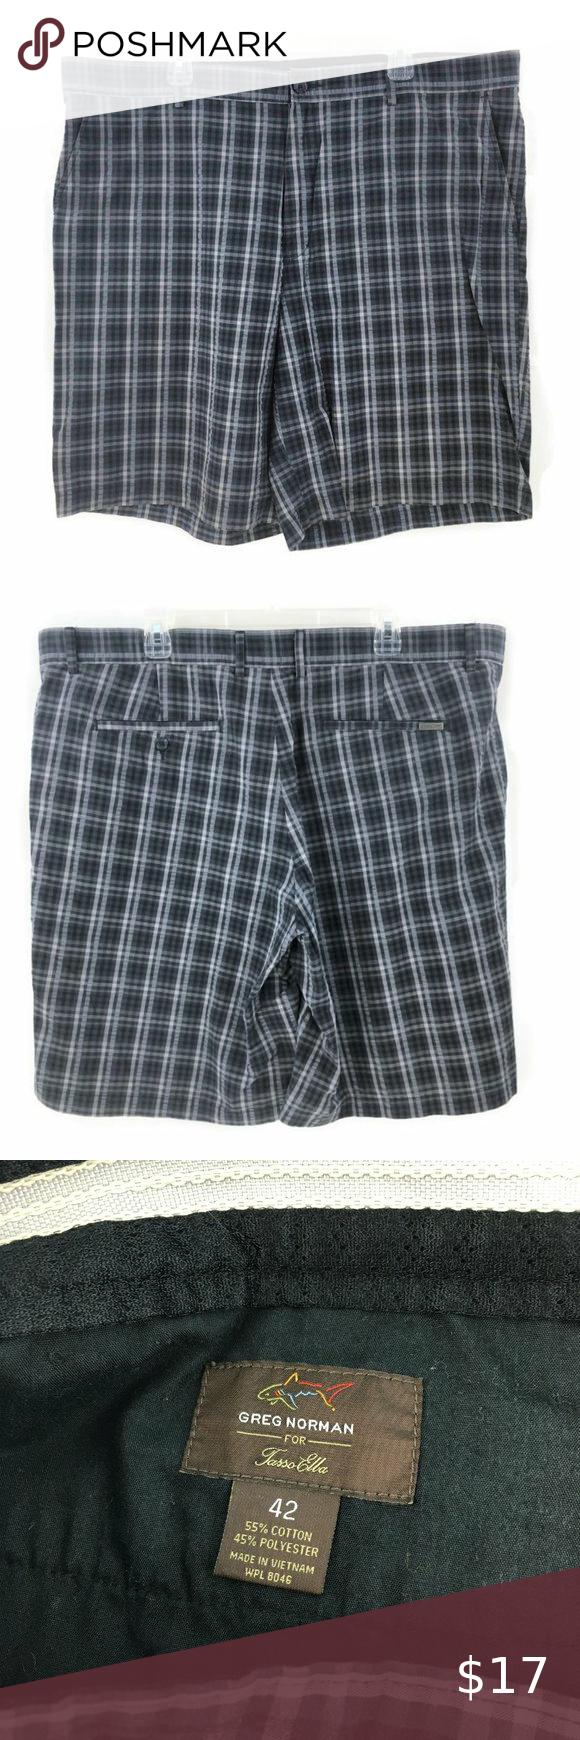 Greg Norman Men S Shorts Seersucker Plaid Ins 11 In 2020 Seersucker Clothes Design Trouser Style